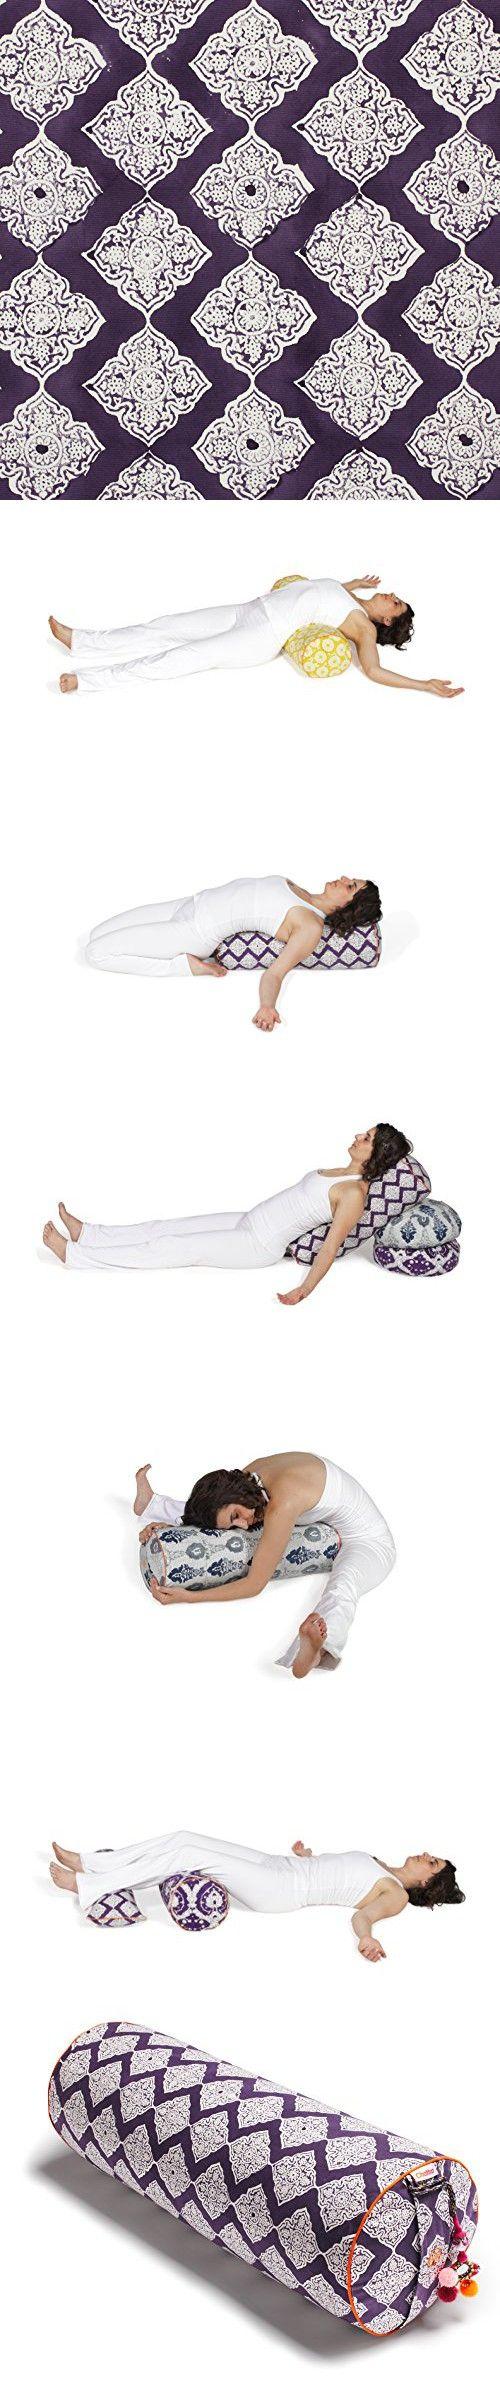 Chattra Plum Jali Round Yoga Bolster